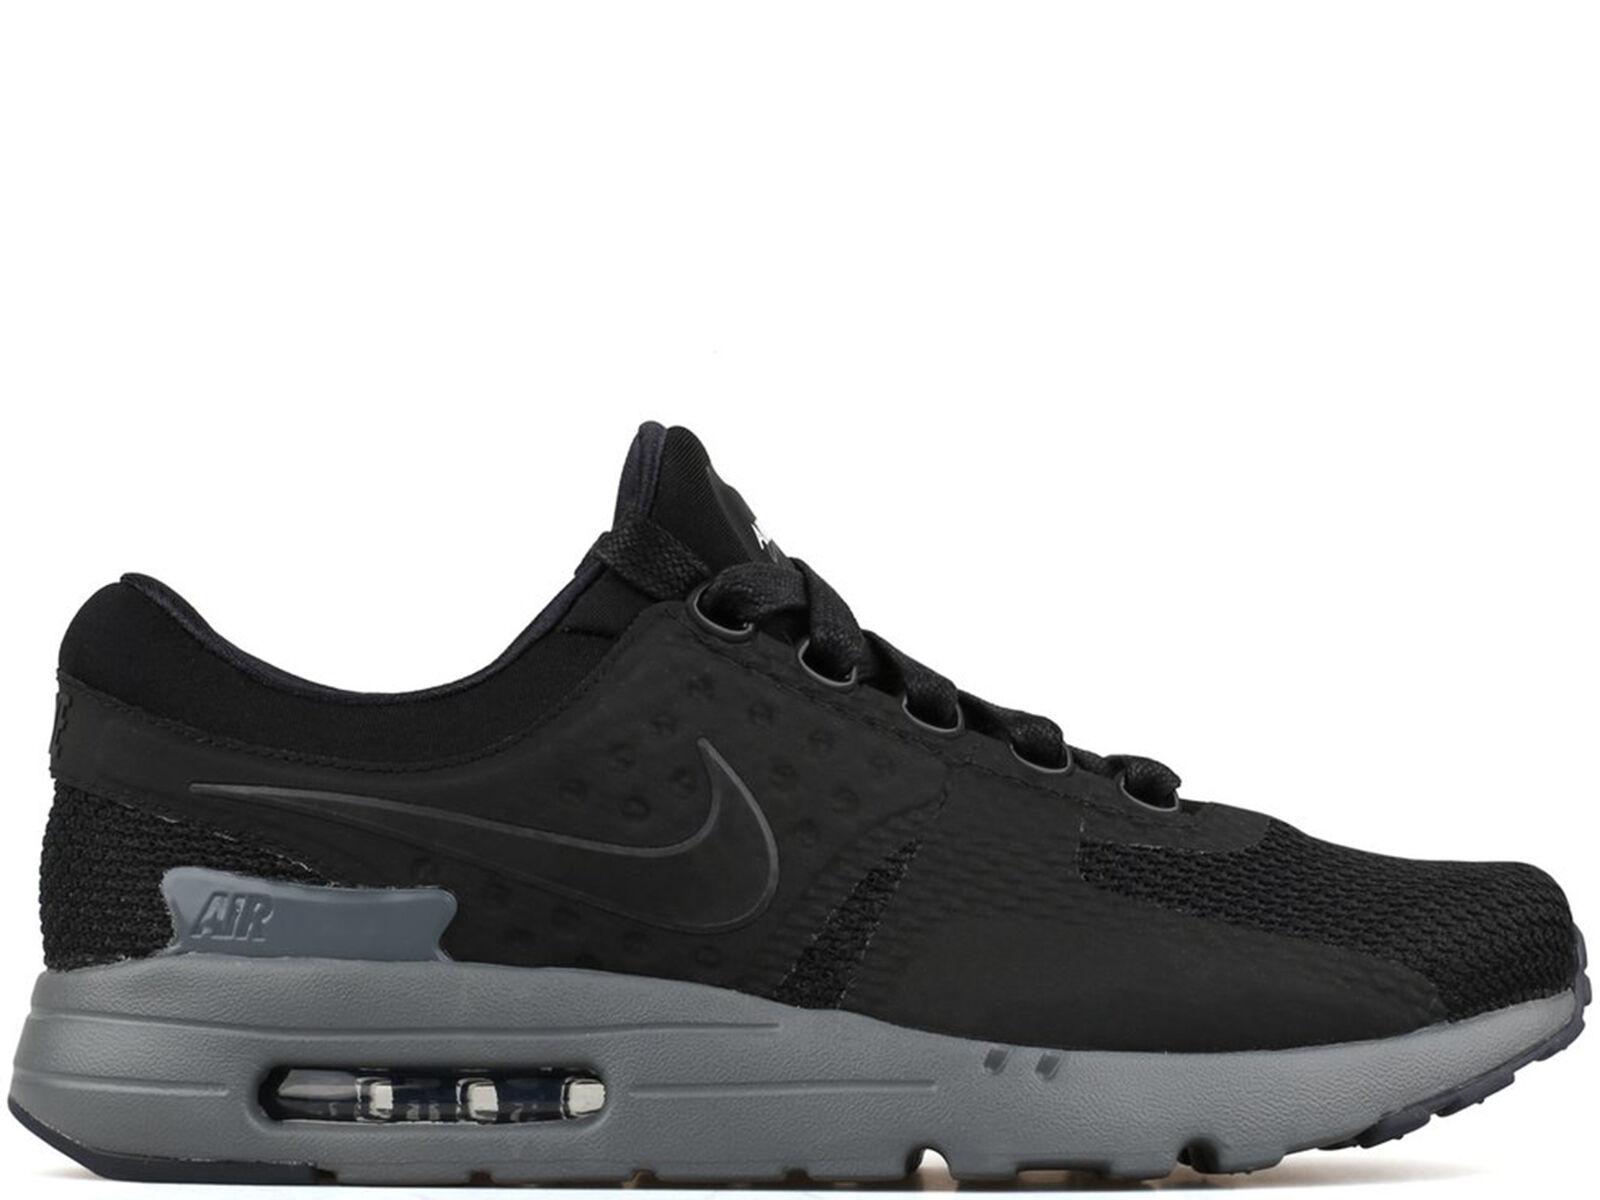 low priced 9eb74 1e756 Nike Air Max Zero QS 789695-001 NikeLab Tier 0 Black Dark Grey DS Size 7.5